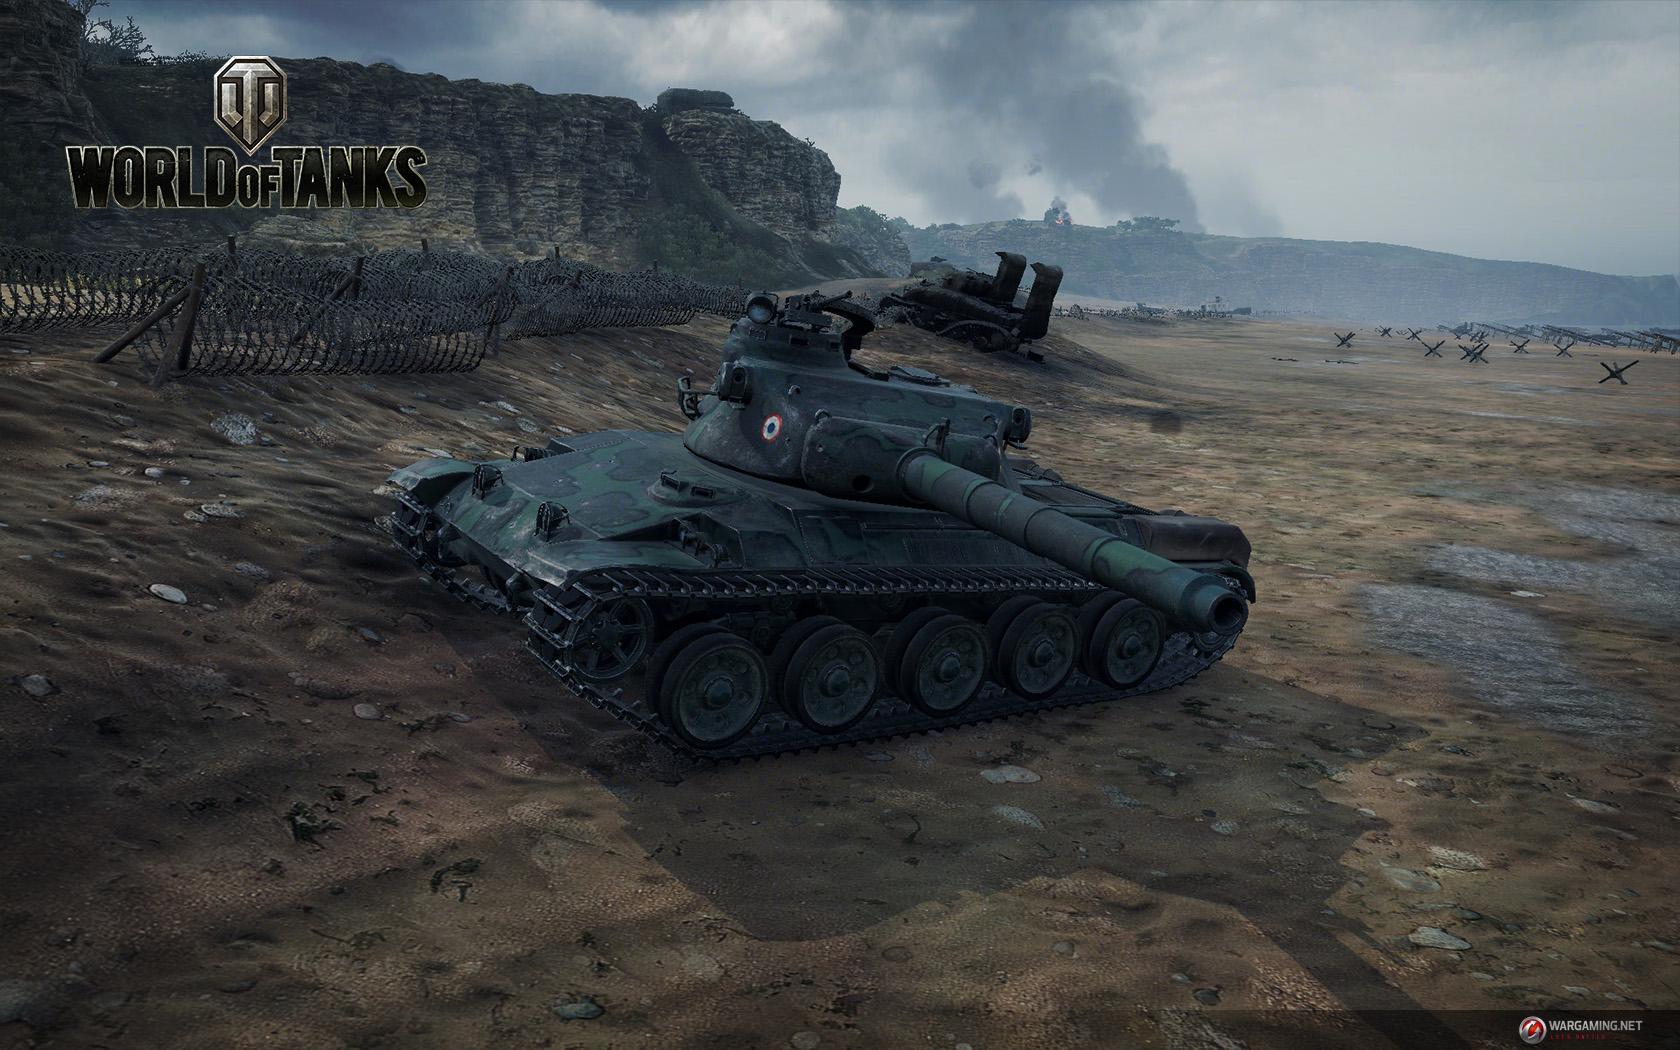 55375fce1da5e_wot_update_9_7_screens_amx30_prototype_image_14.jpg - World of Tanks